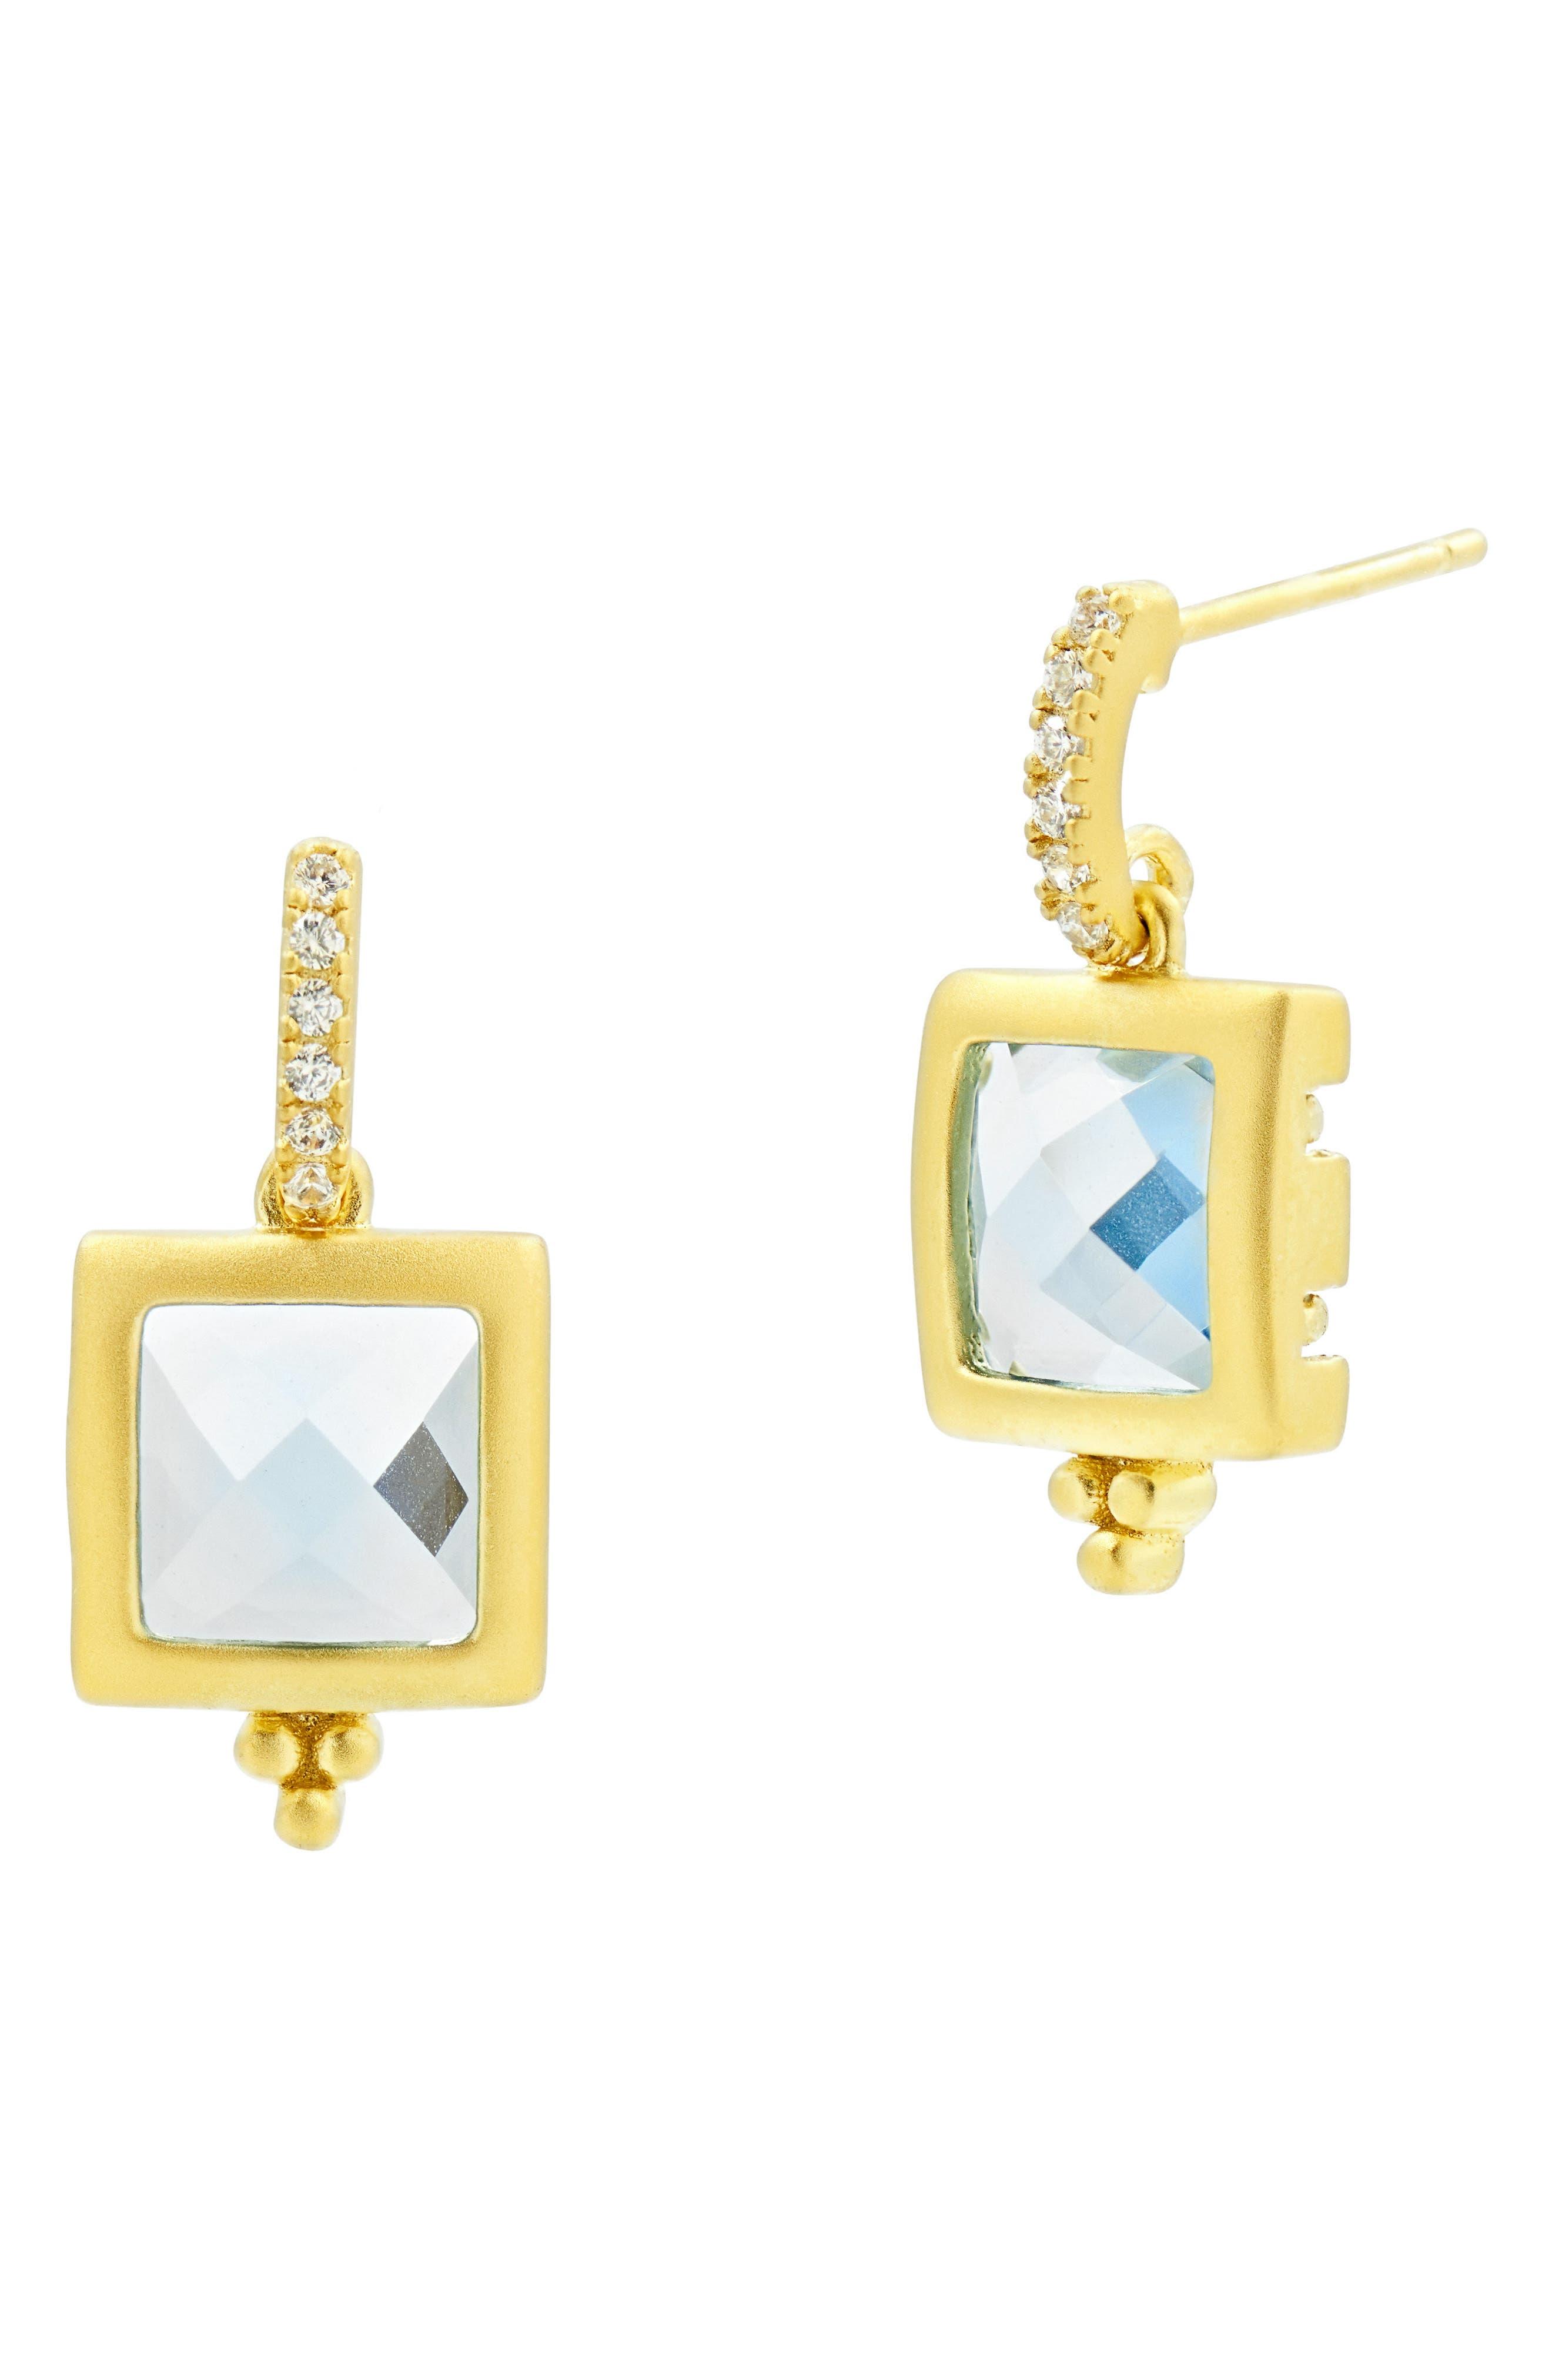 Ocean Azure Cubic Zirconia Stud Earrings,                         Main,                         color, GOLD/ AQUA